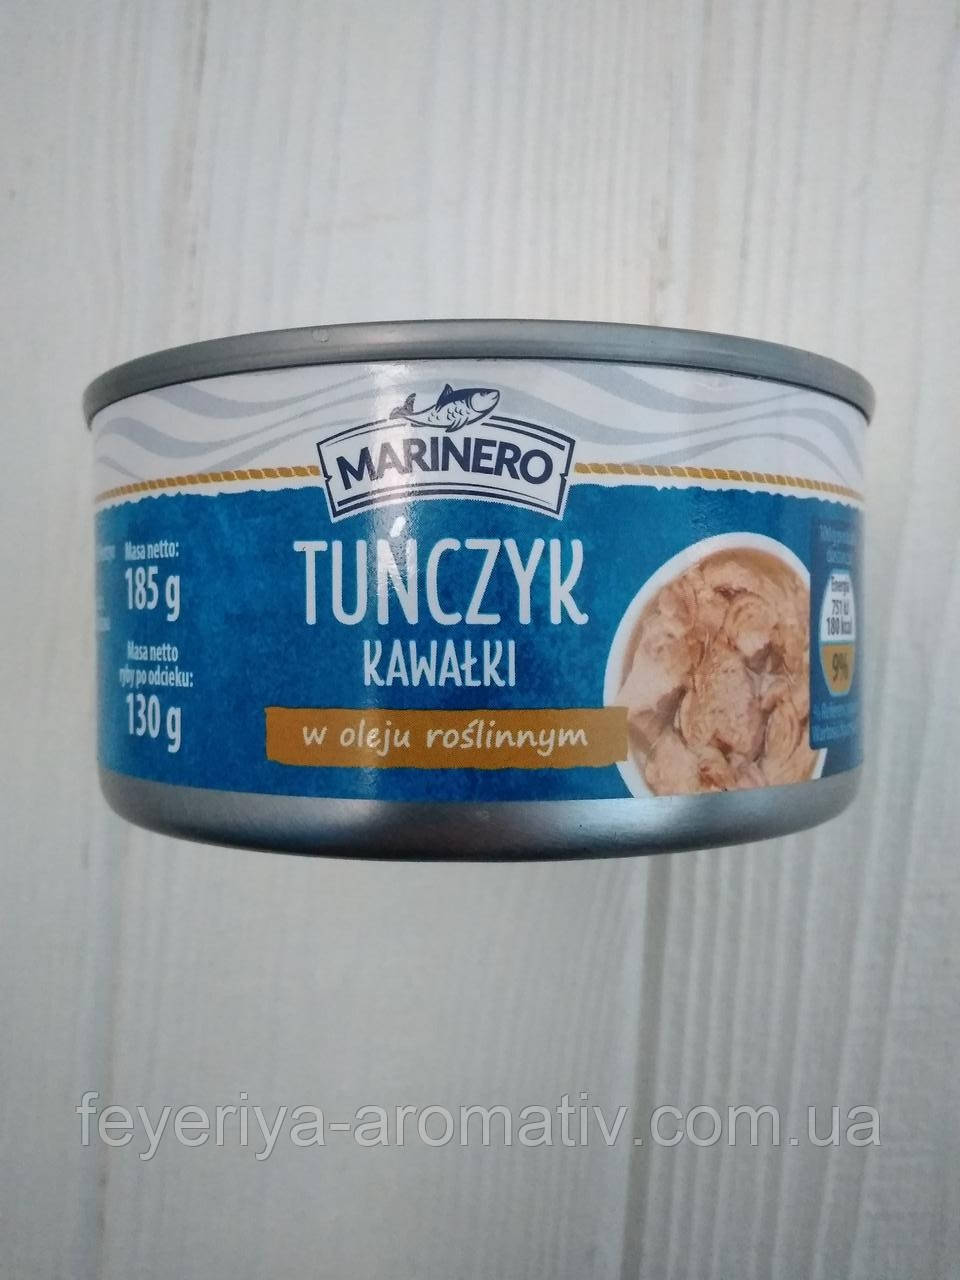 Тунец в подсолнечном масле Marinero Tunczyk kawalki 185гр/130гр (Польша)